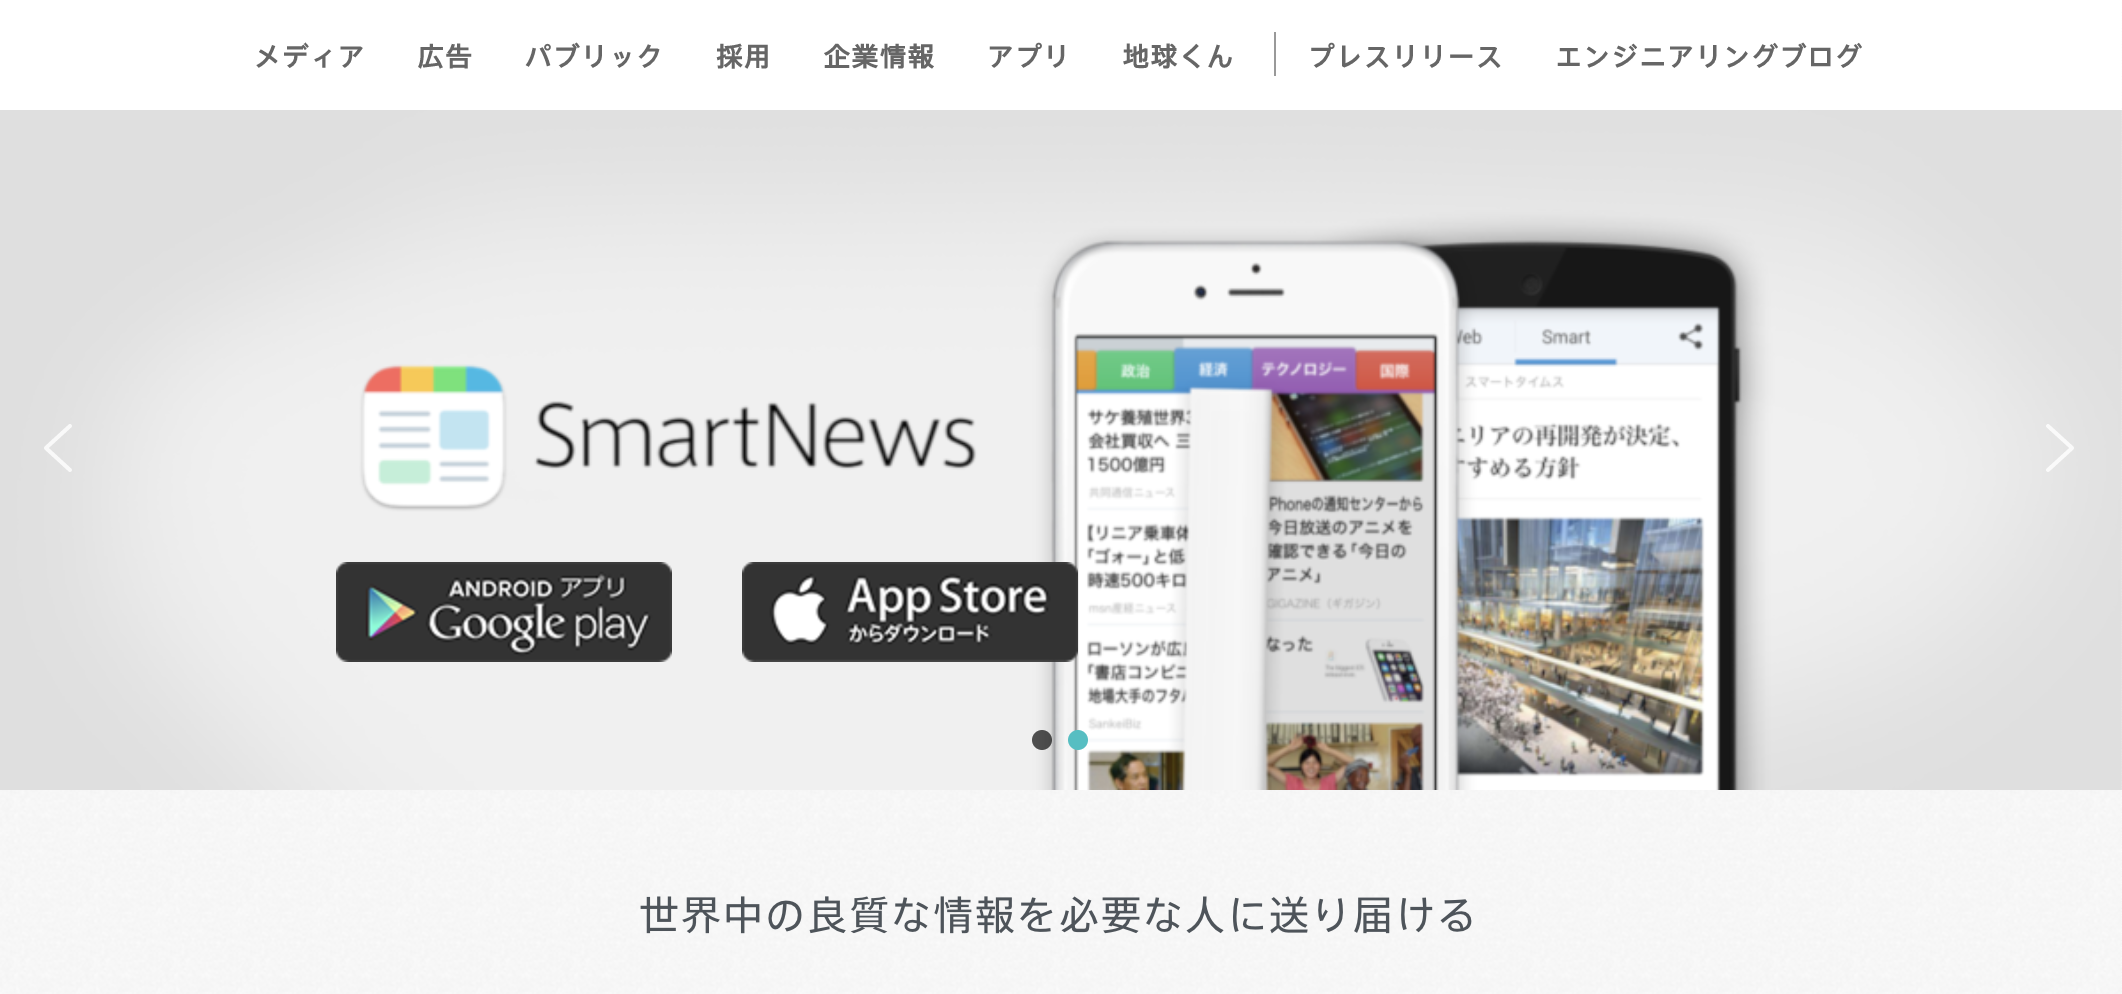 SmartNews公式HP